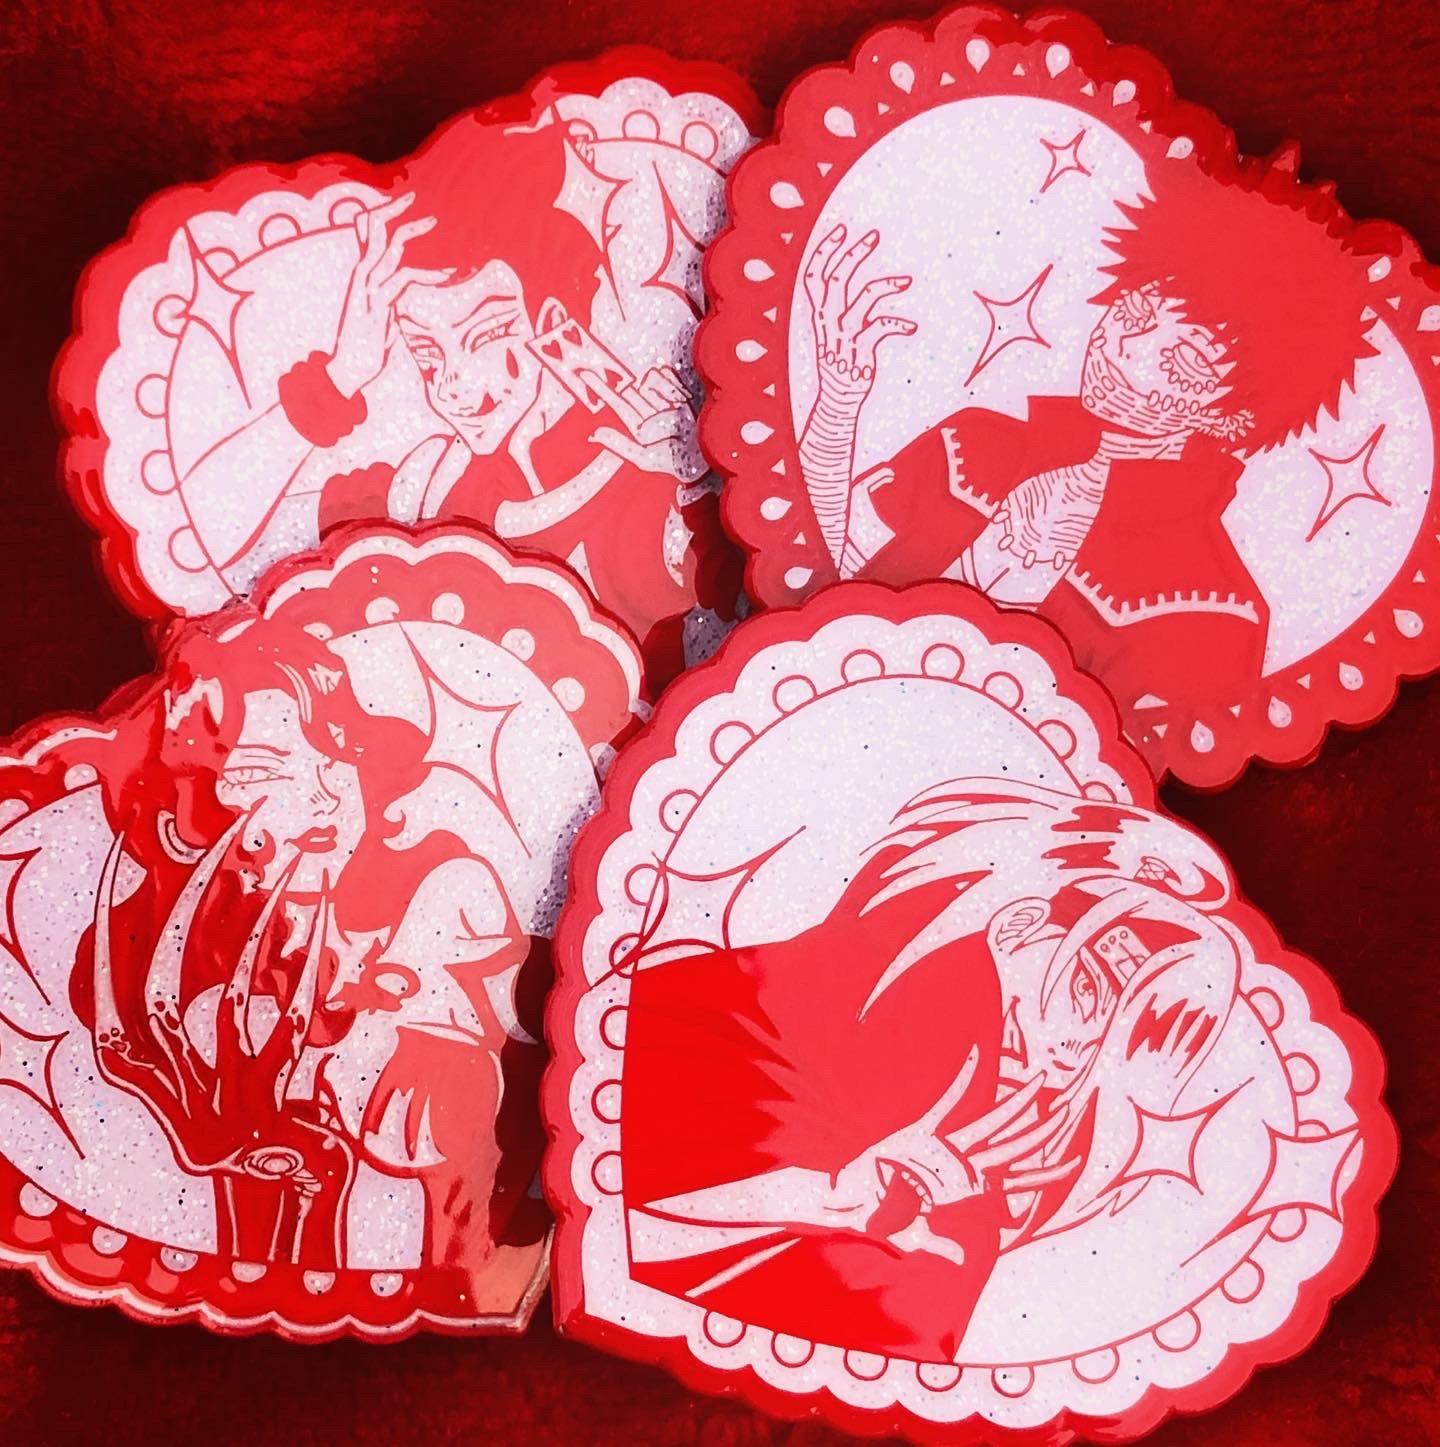 Image of Series Exclusive Villaintine's Hearts Set   SOFT ENAMEL PIN + EPOXY